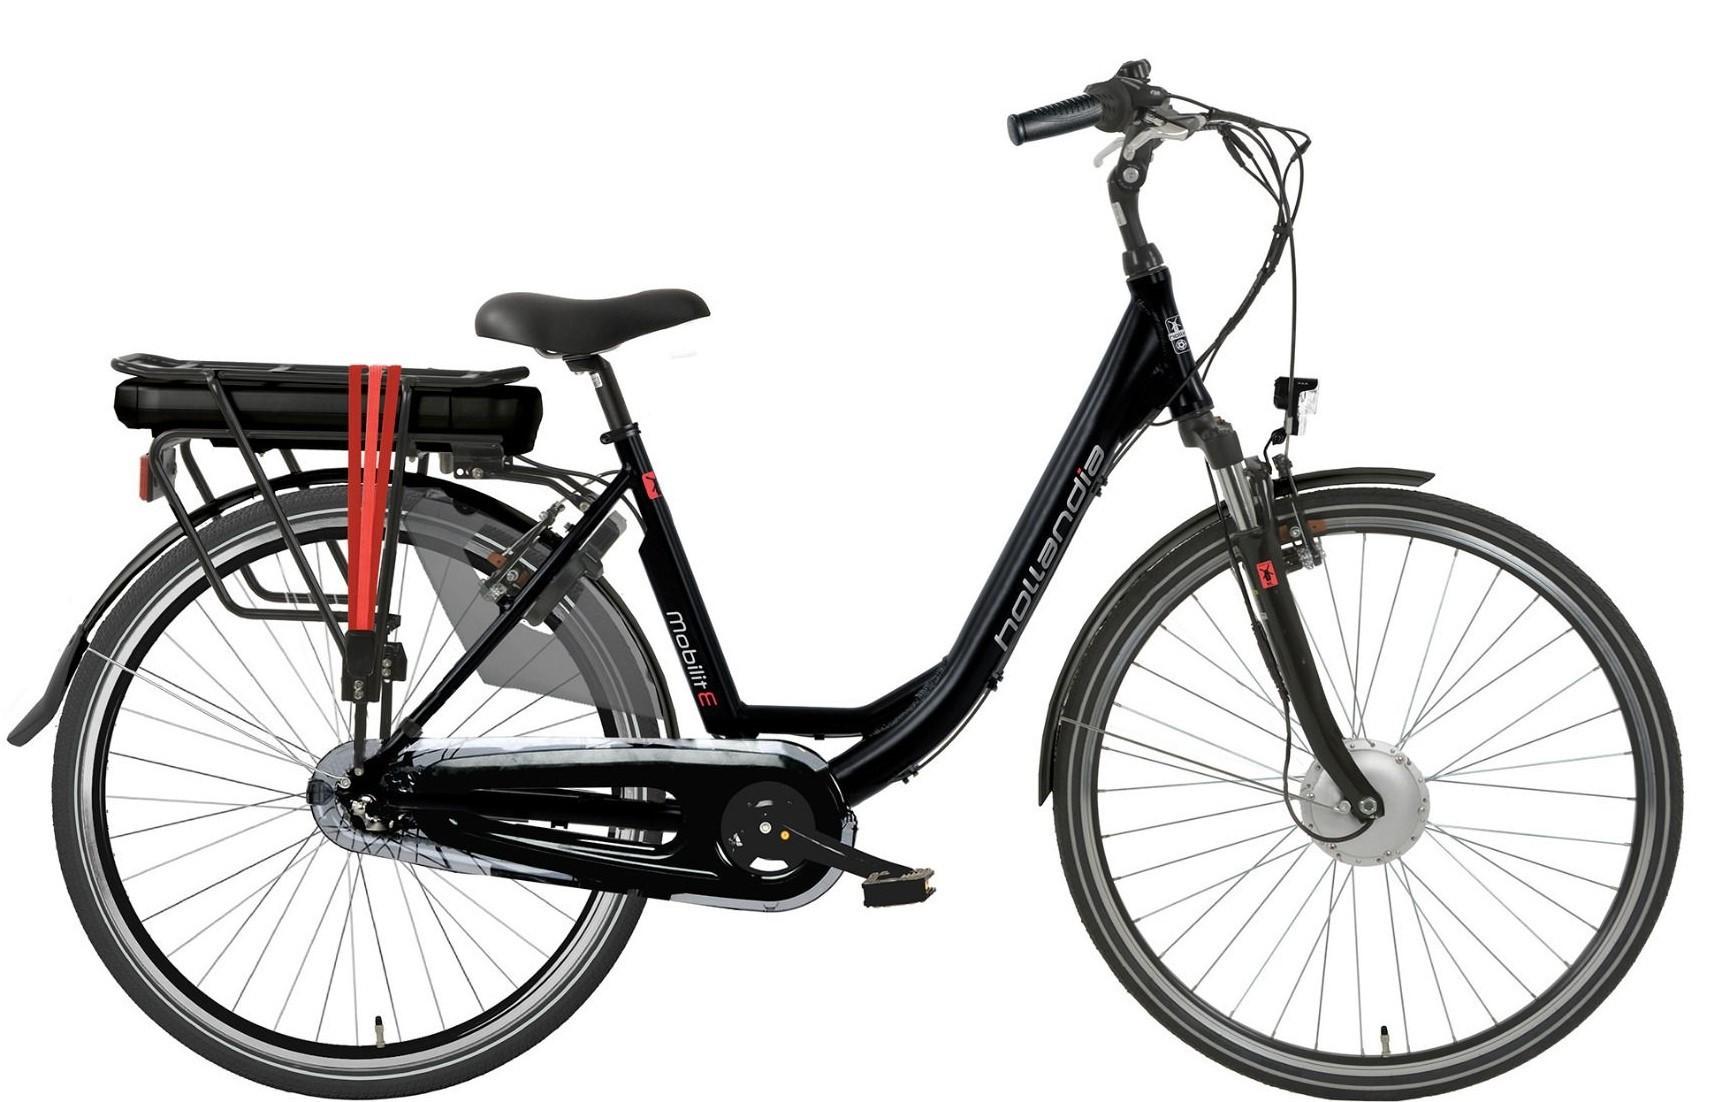 Hollandia Mobilit E-bike 3V met voorwielmotor